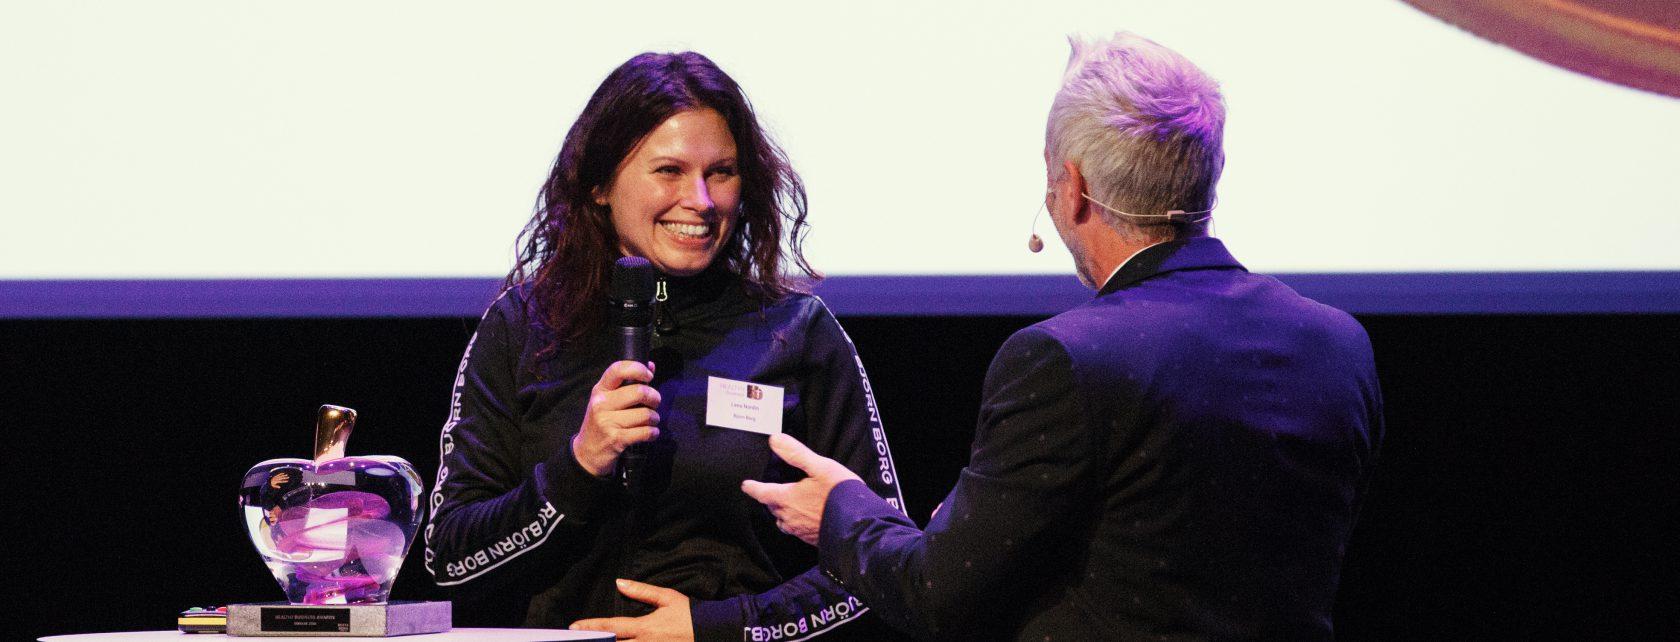 Björn Borg HR Director Lena Nordin accepting the award